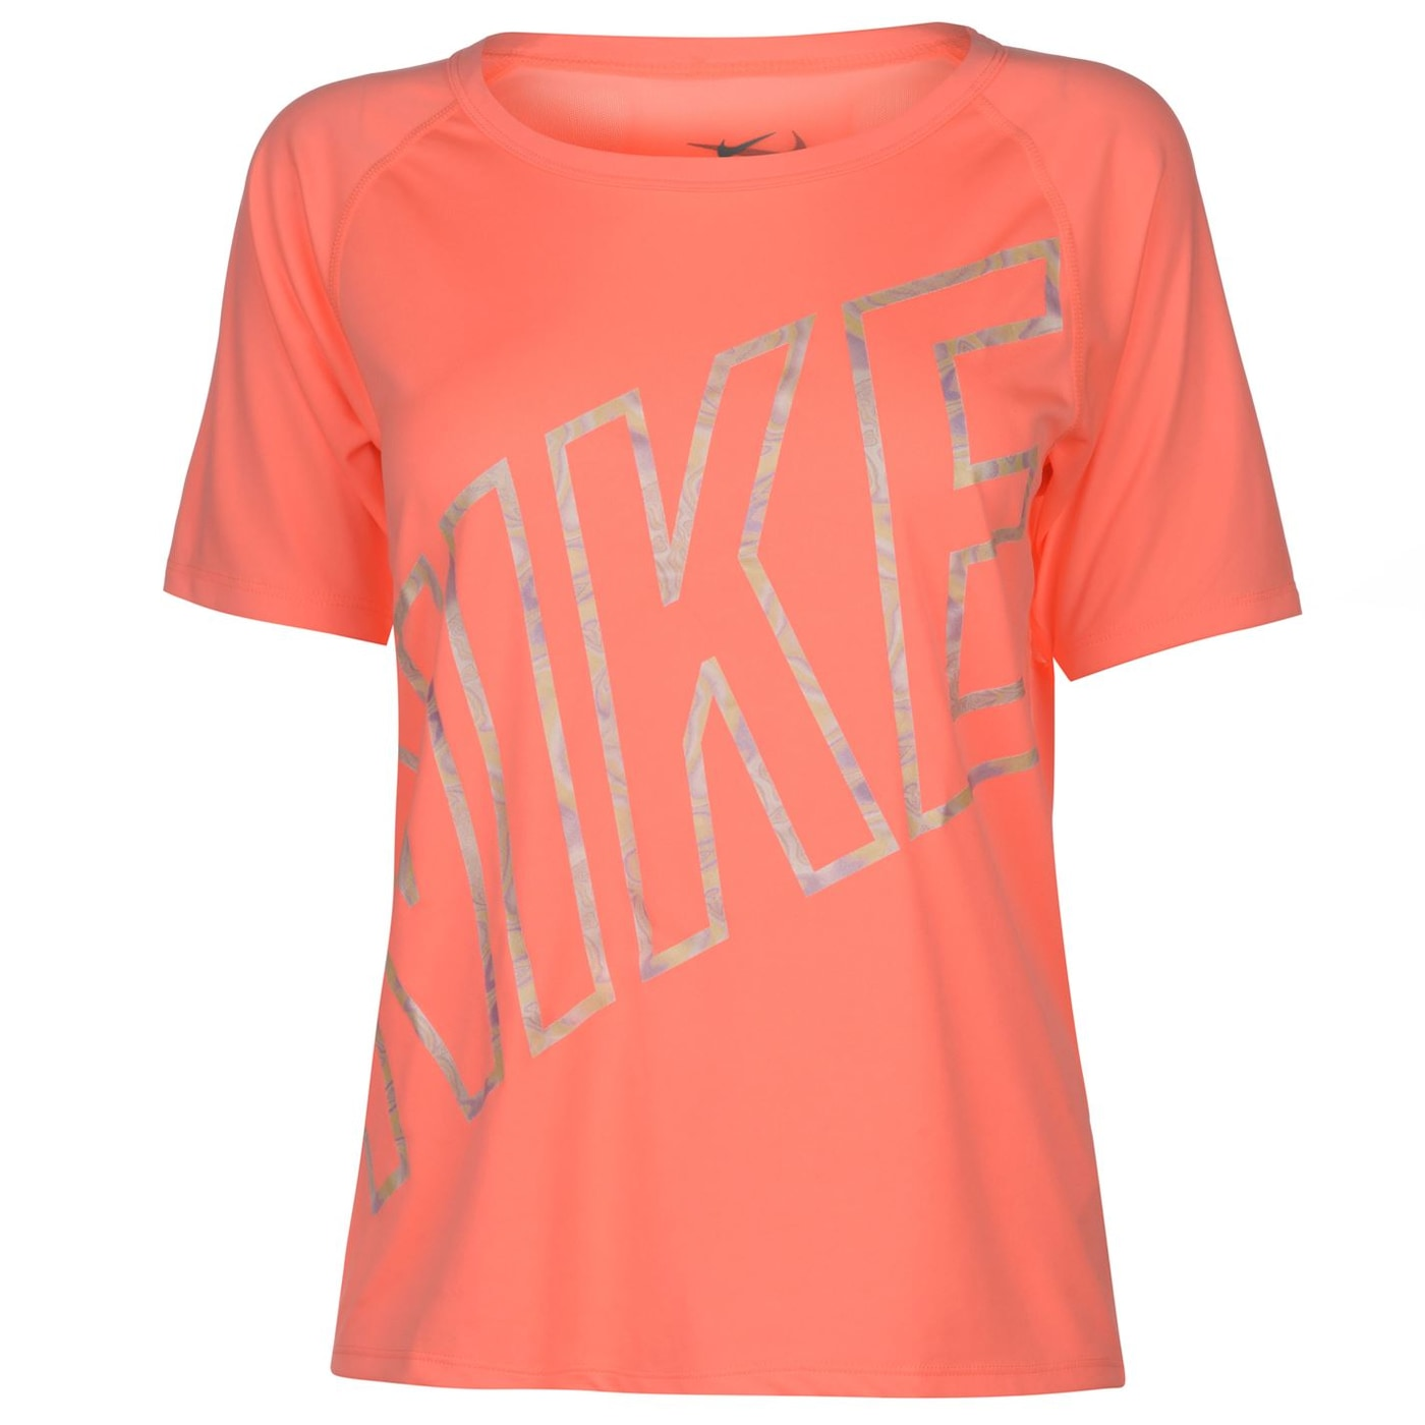 Triko Nike Racer Short Sleeved T Shirt dámské